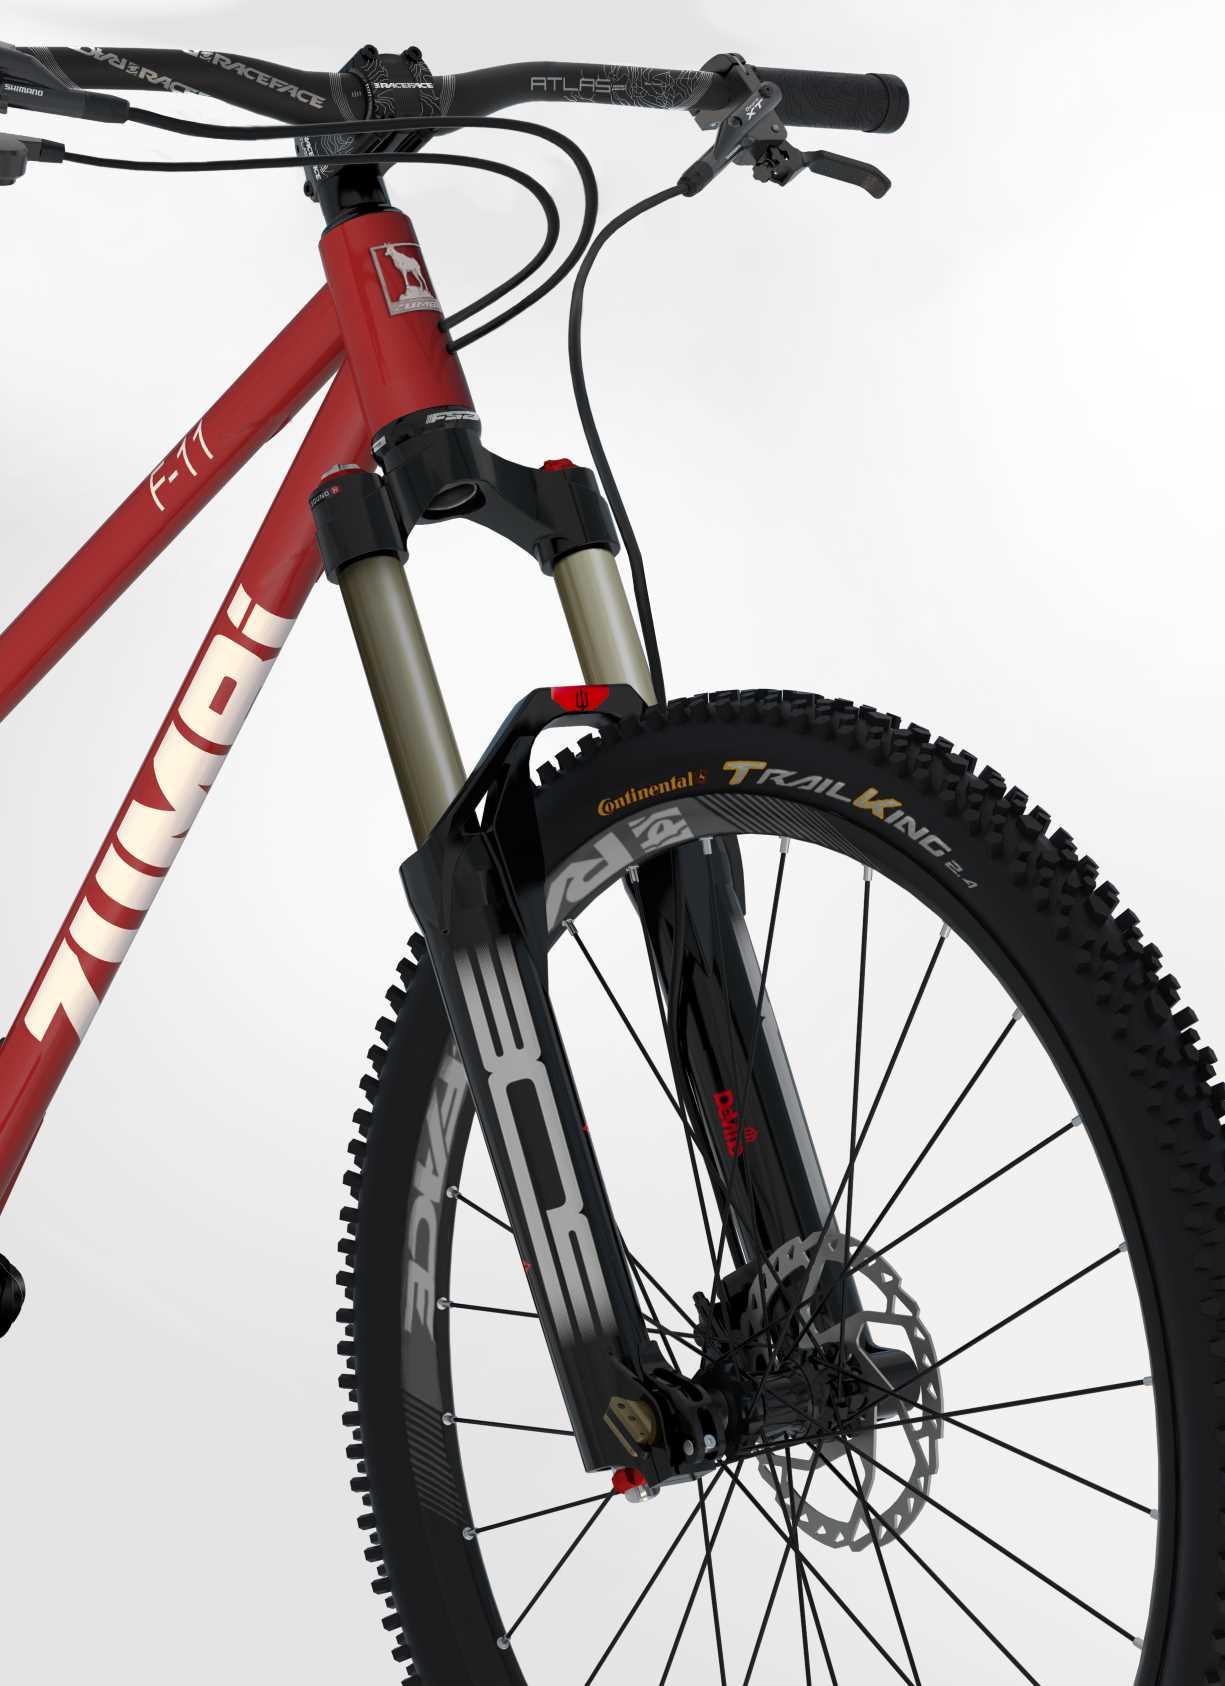 zumbi cycles 4 uk